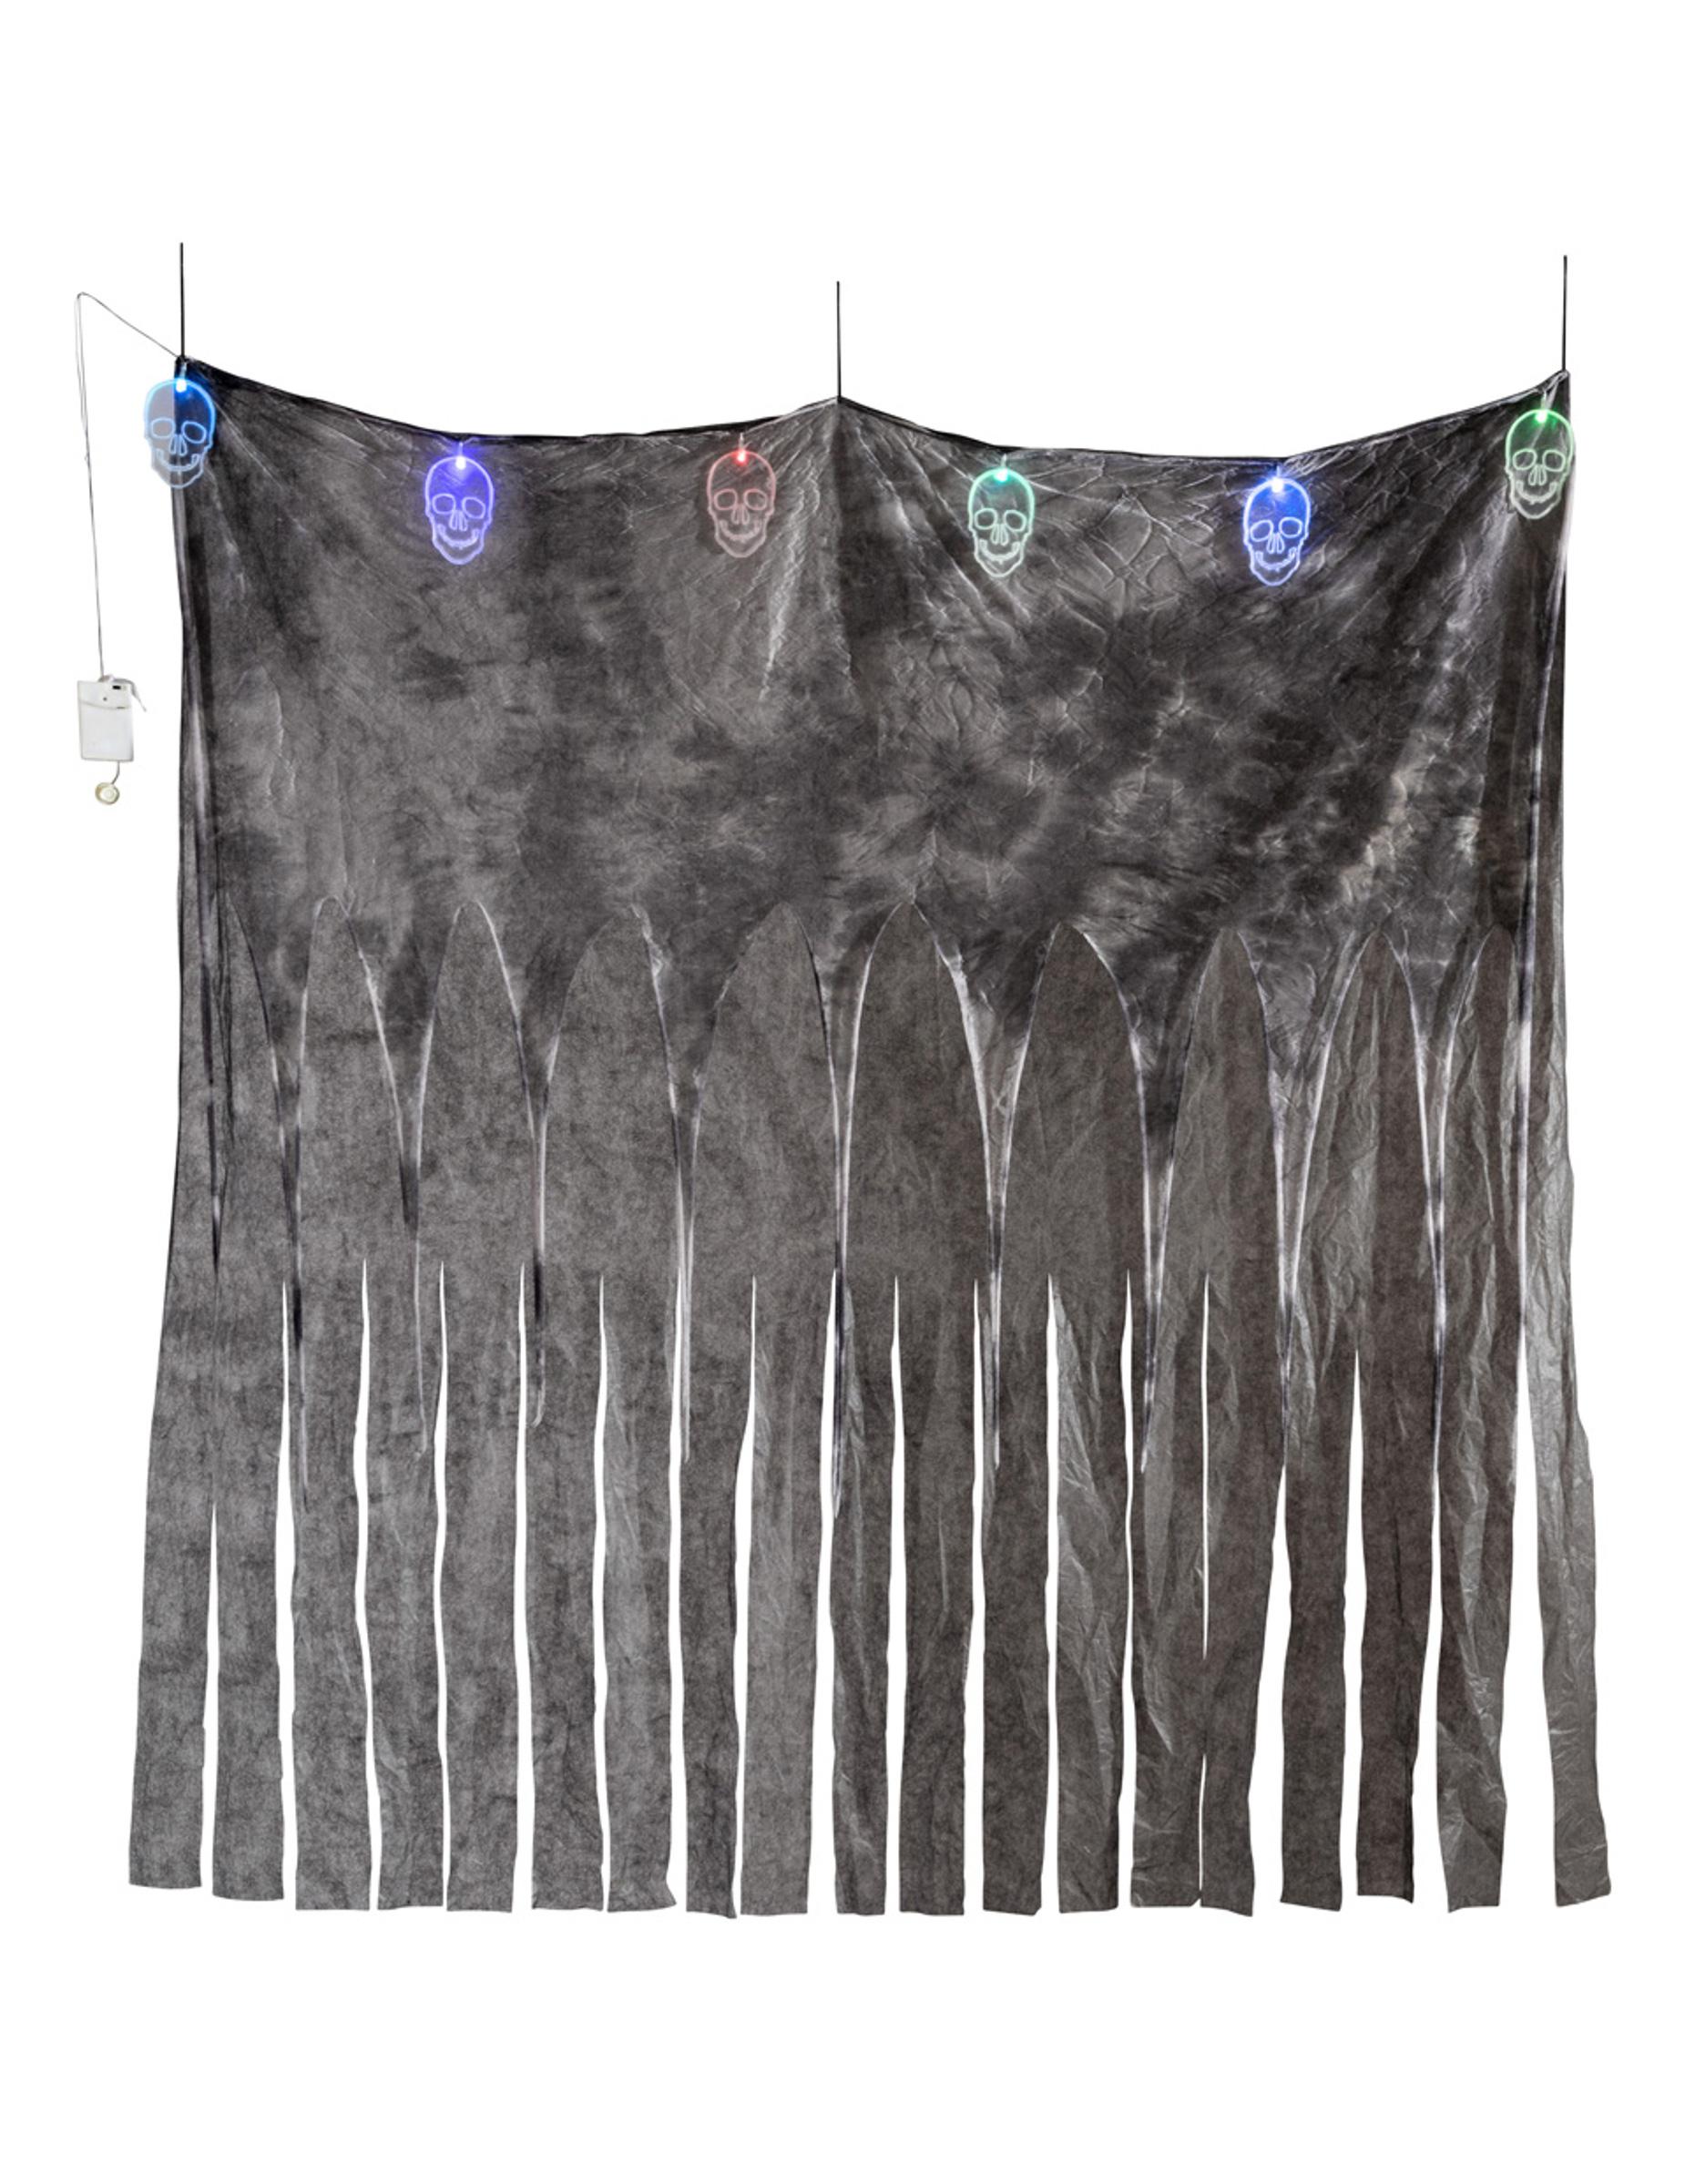 Düsterer Totenkopf-Vorhang für Halloween bunt 185 x 140 cm 295778